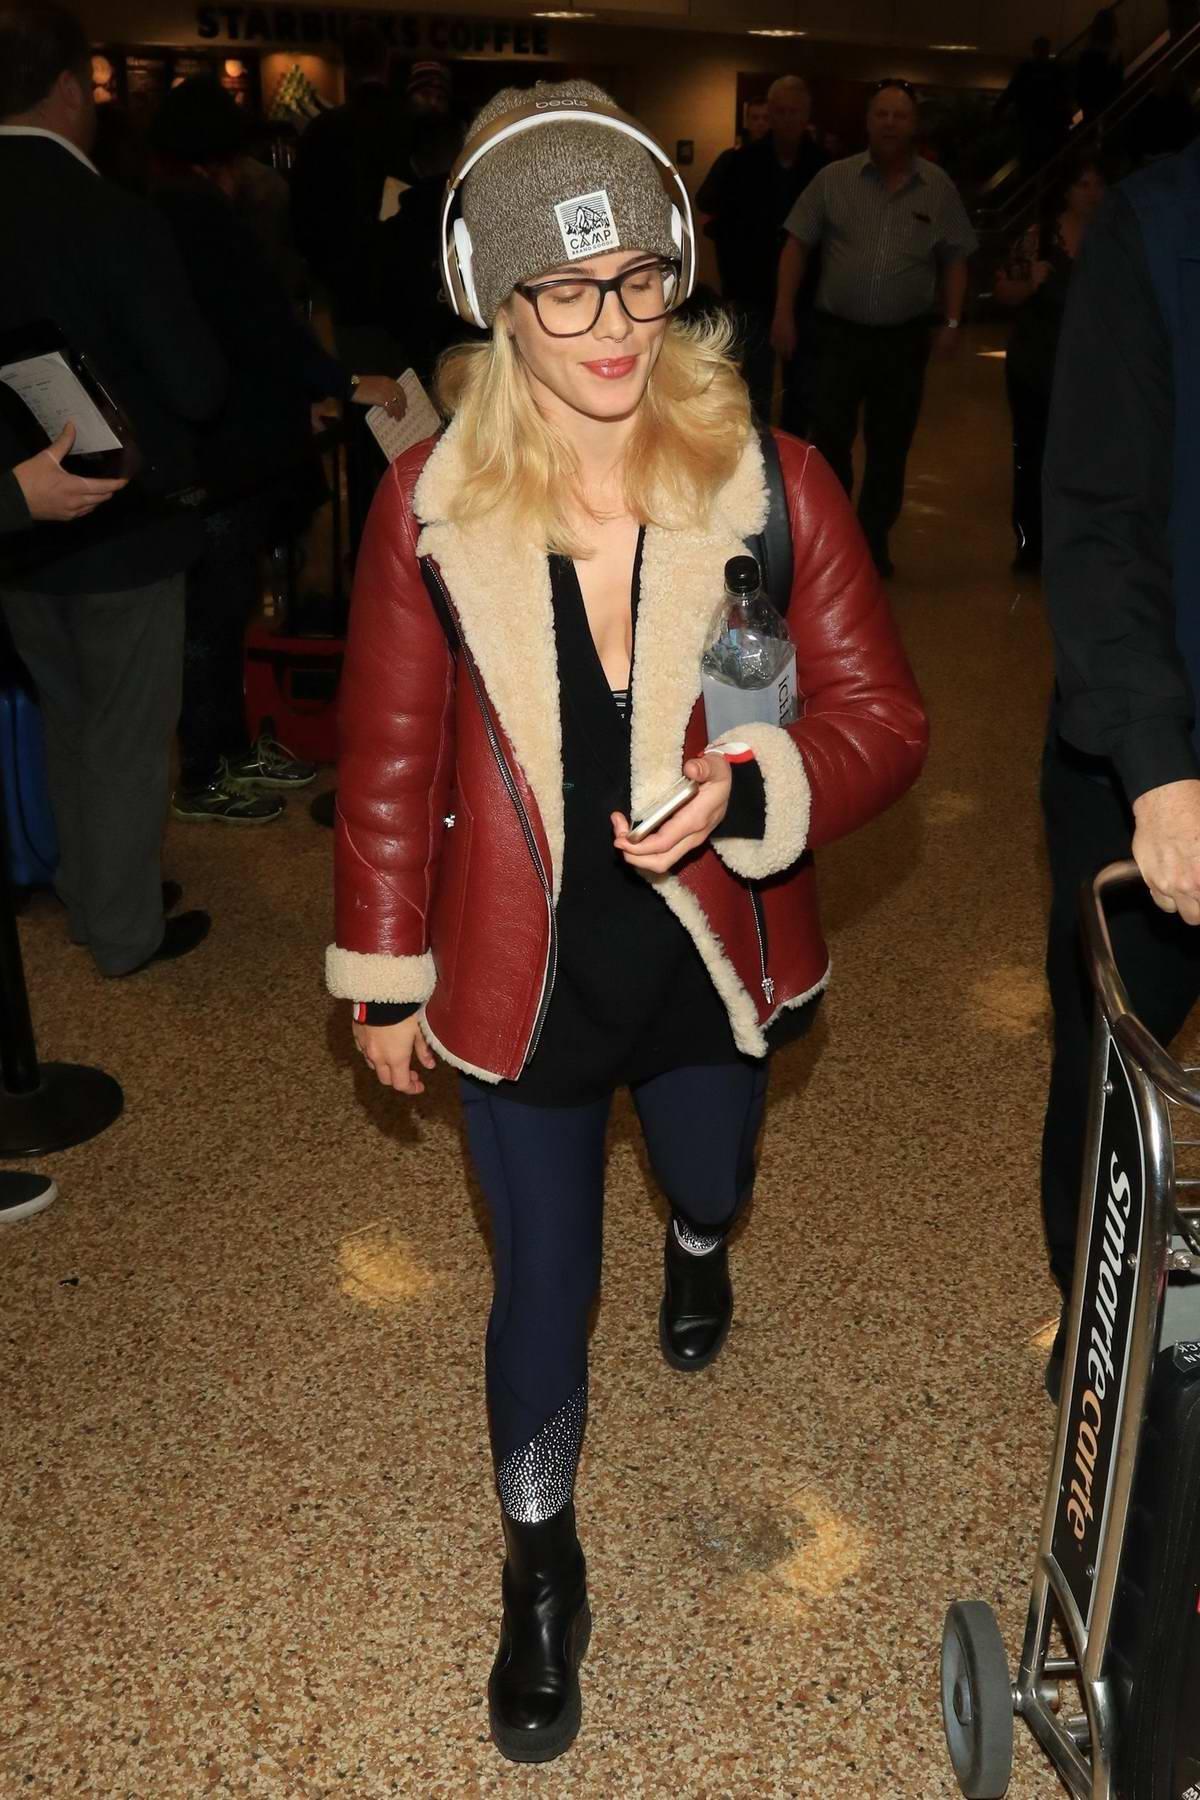 Emily Bett Rickards arrives at the Salt Lake City International Airport in Park City, Utah